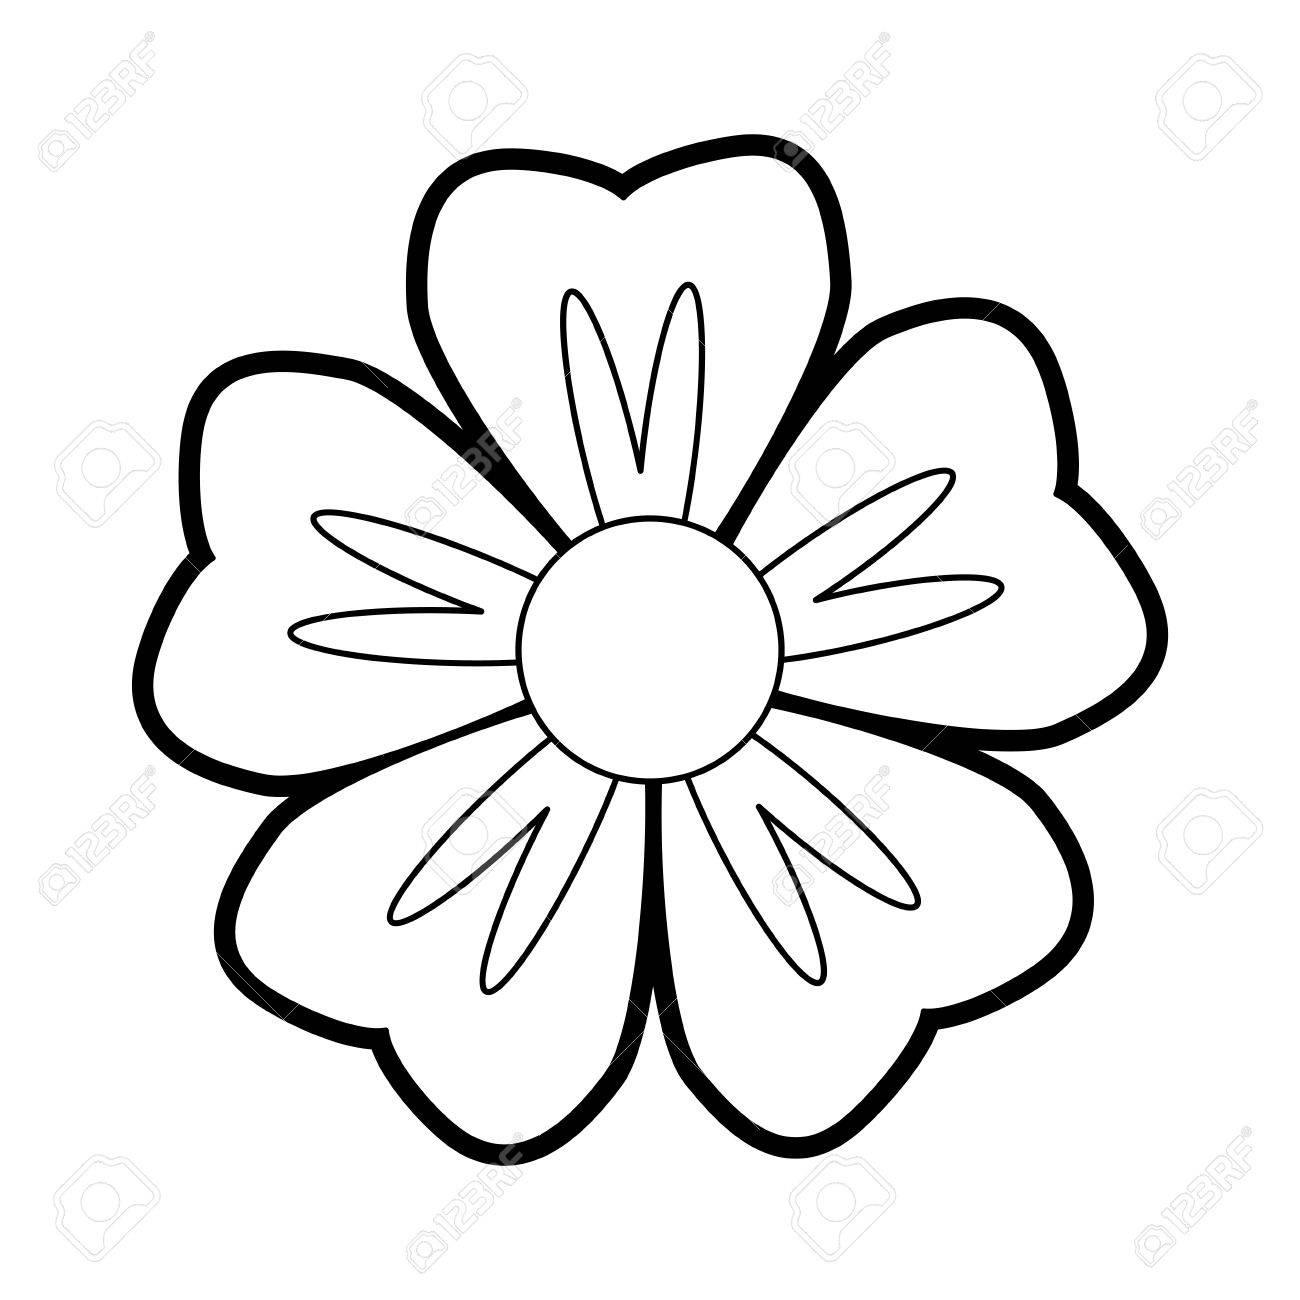 single paint flower icon image vector illustration draw